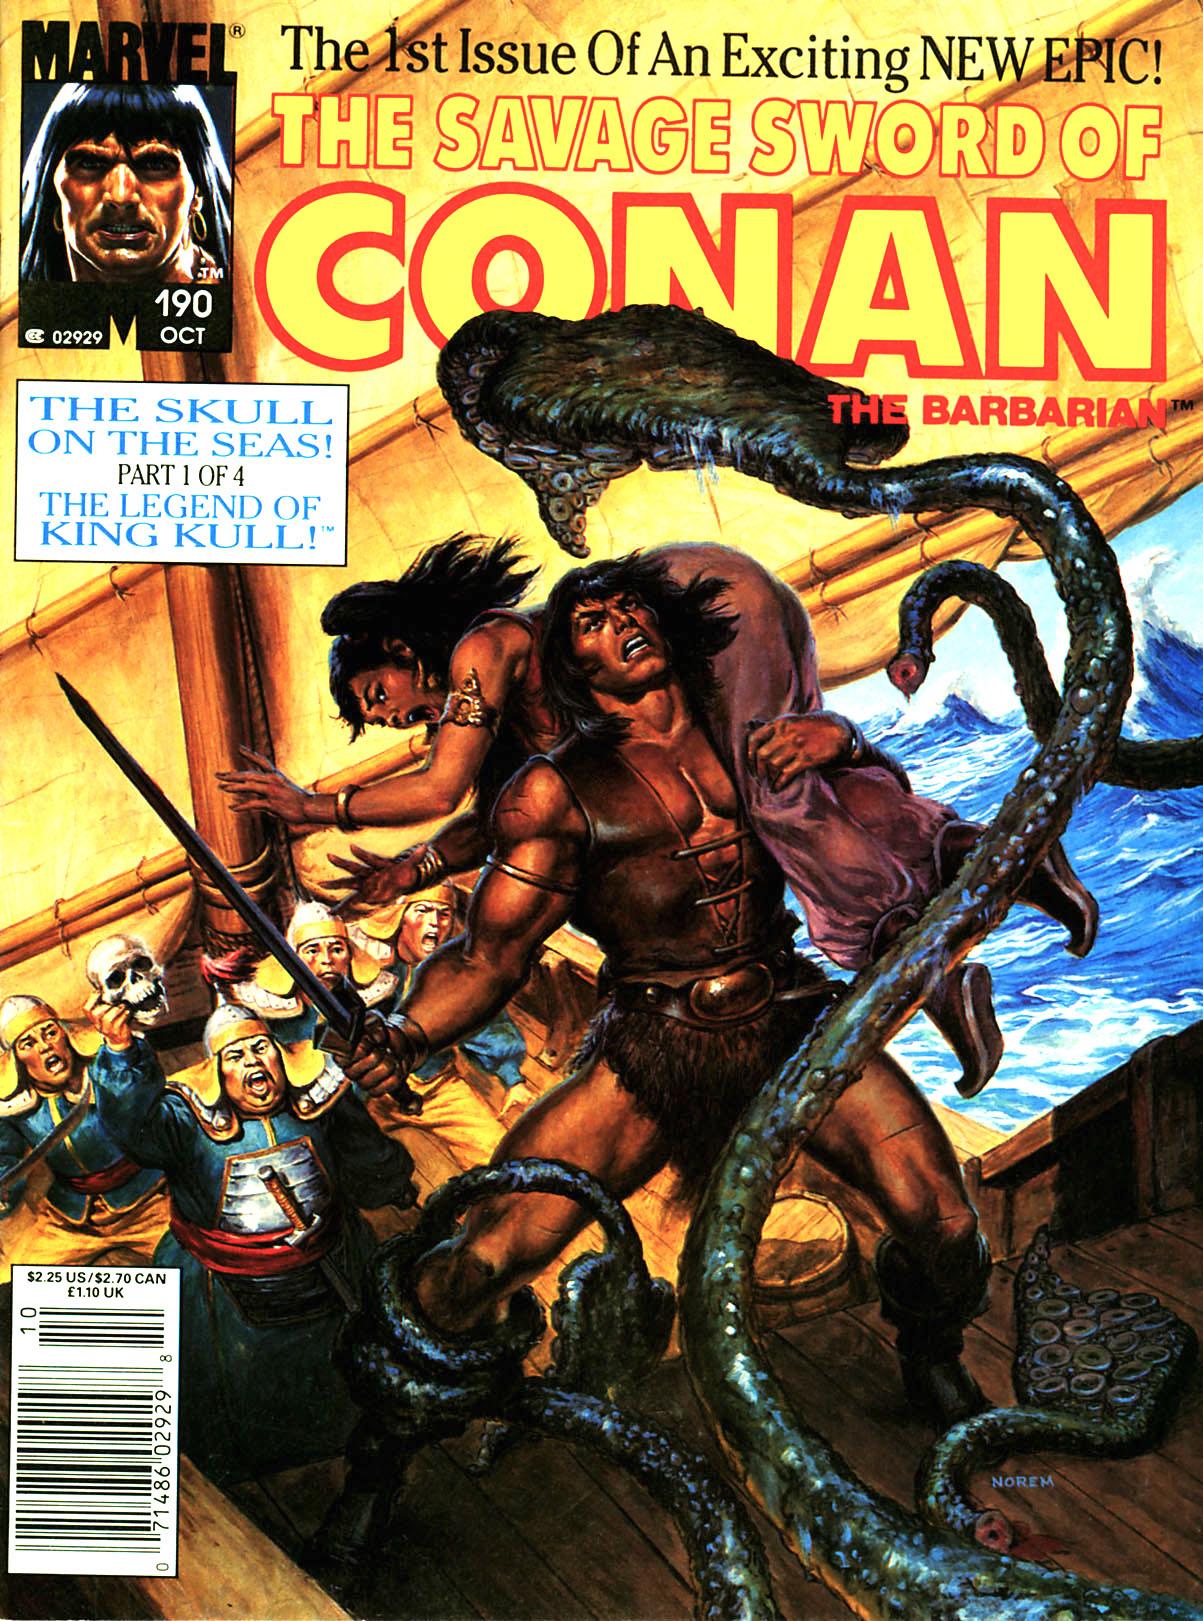 The Savage Sword of Conan #190.jpg